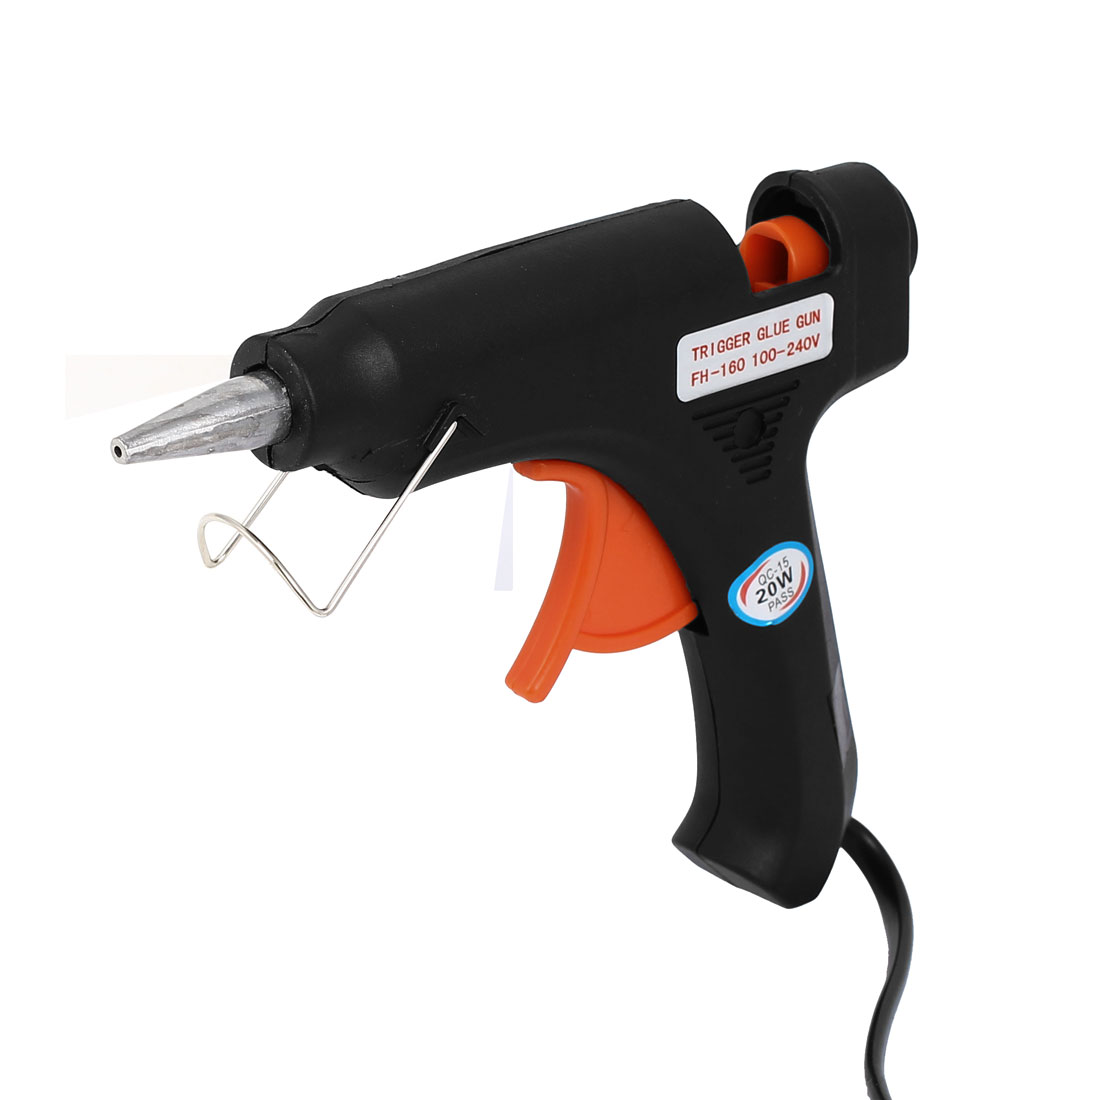 Art Craft Repair Tool Electric Heating Hot Melt Sticks Trigger Glue Gun 20W